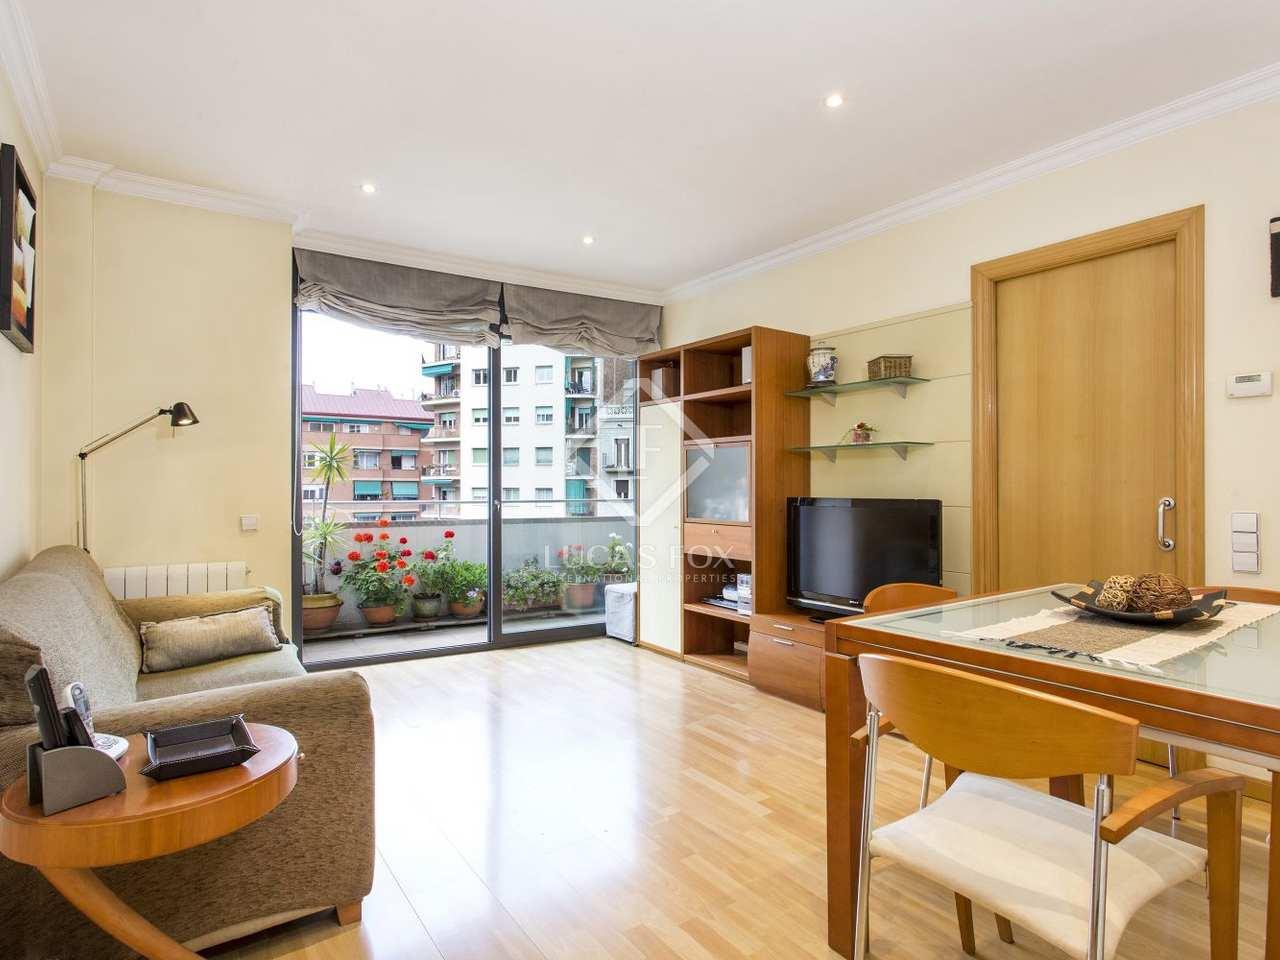 Appartement de 75m a vendre gr cia barcelone - Appartement a vendre barcelone ...